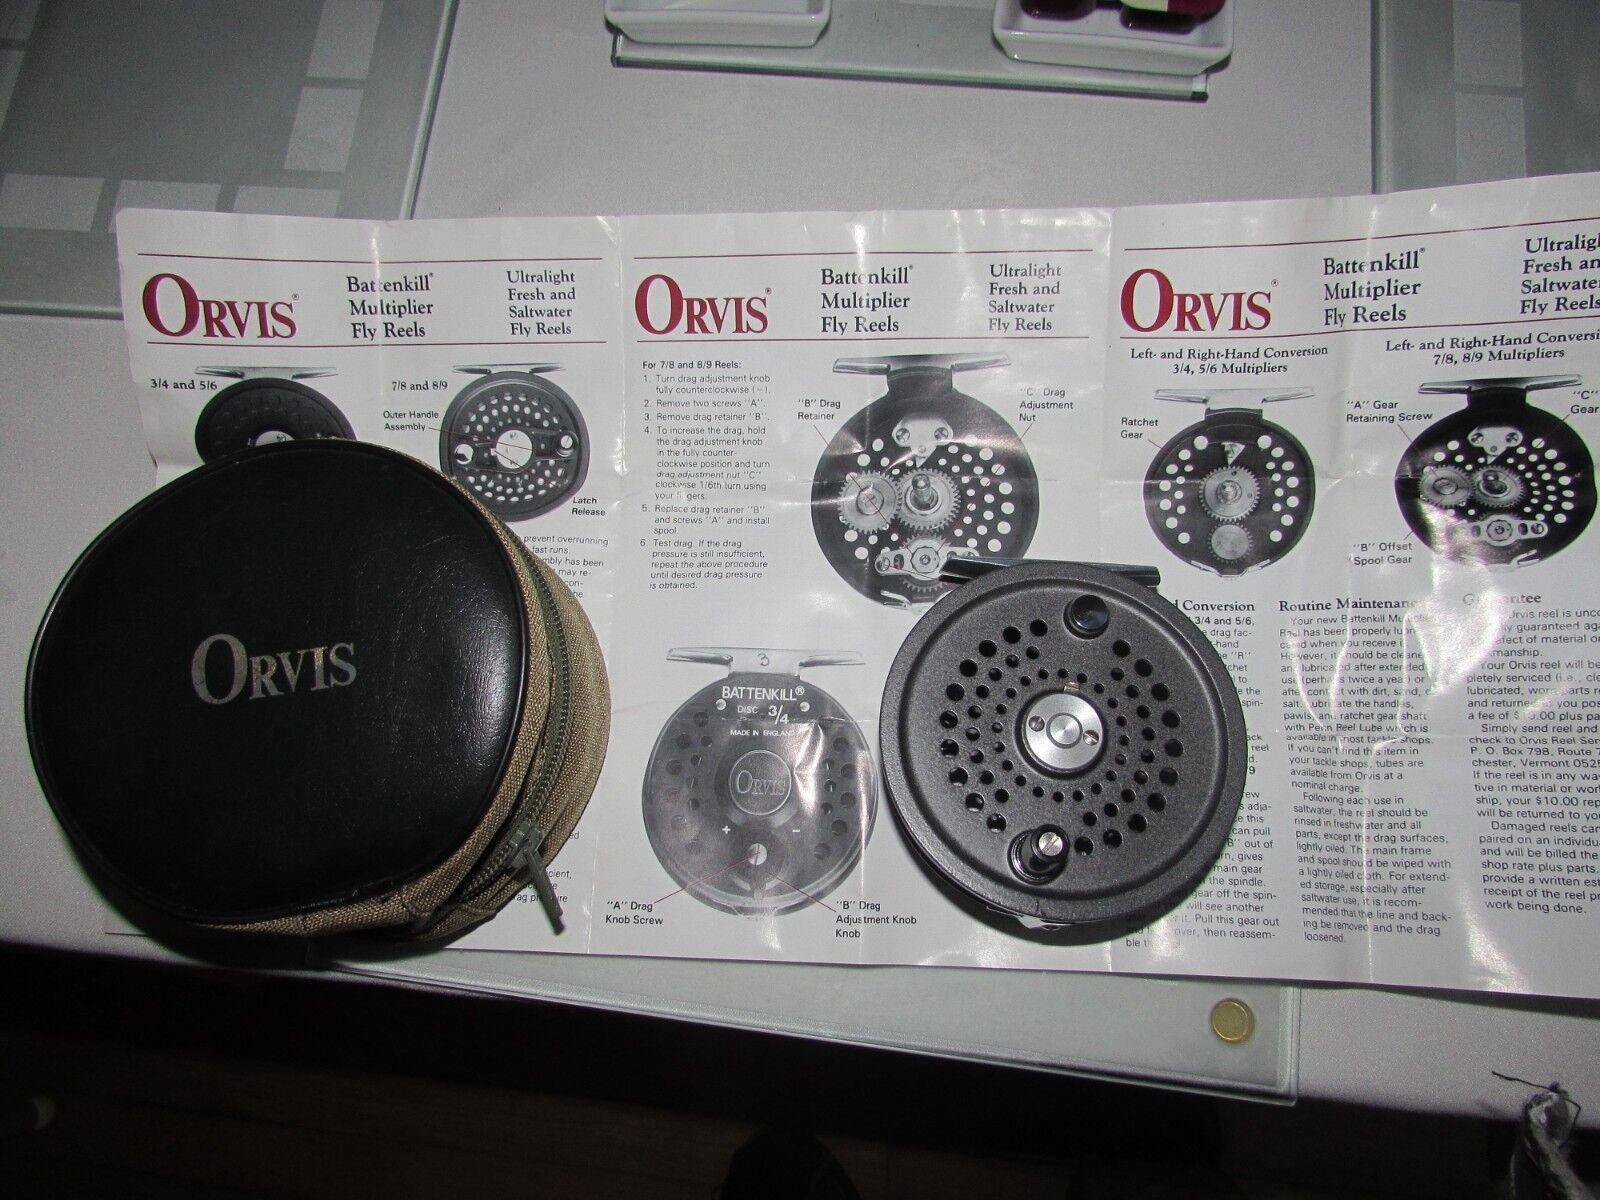 Stunning unused  orvis  battenkill disc 10 11 salmon fly fishing reel & case ,.   save 50%-75%off